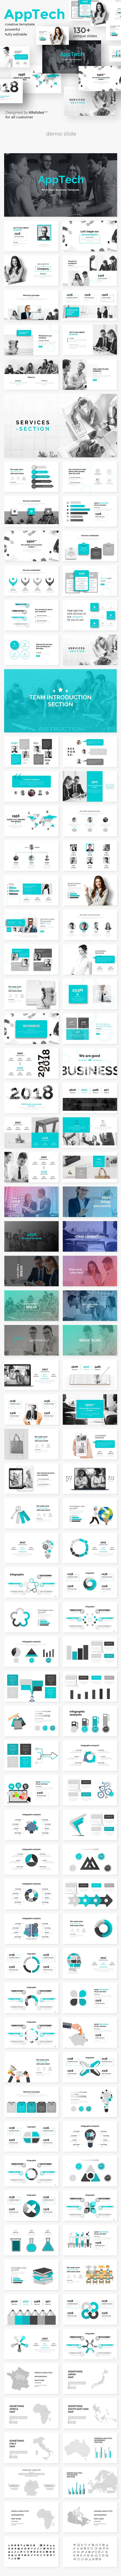 Apptech Deck Business Google Slide Template - Google Slides Presentation Templates